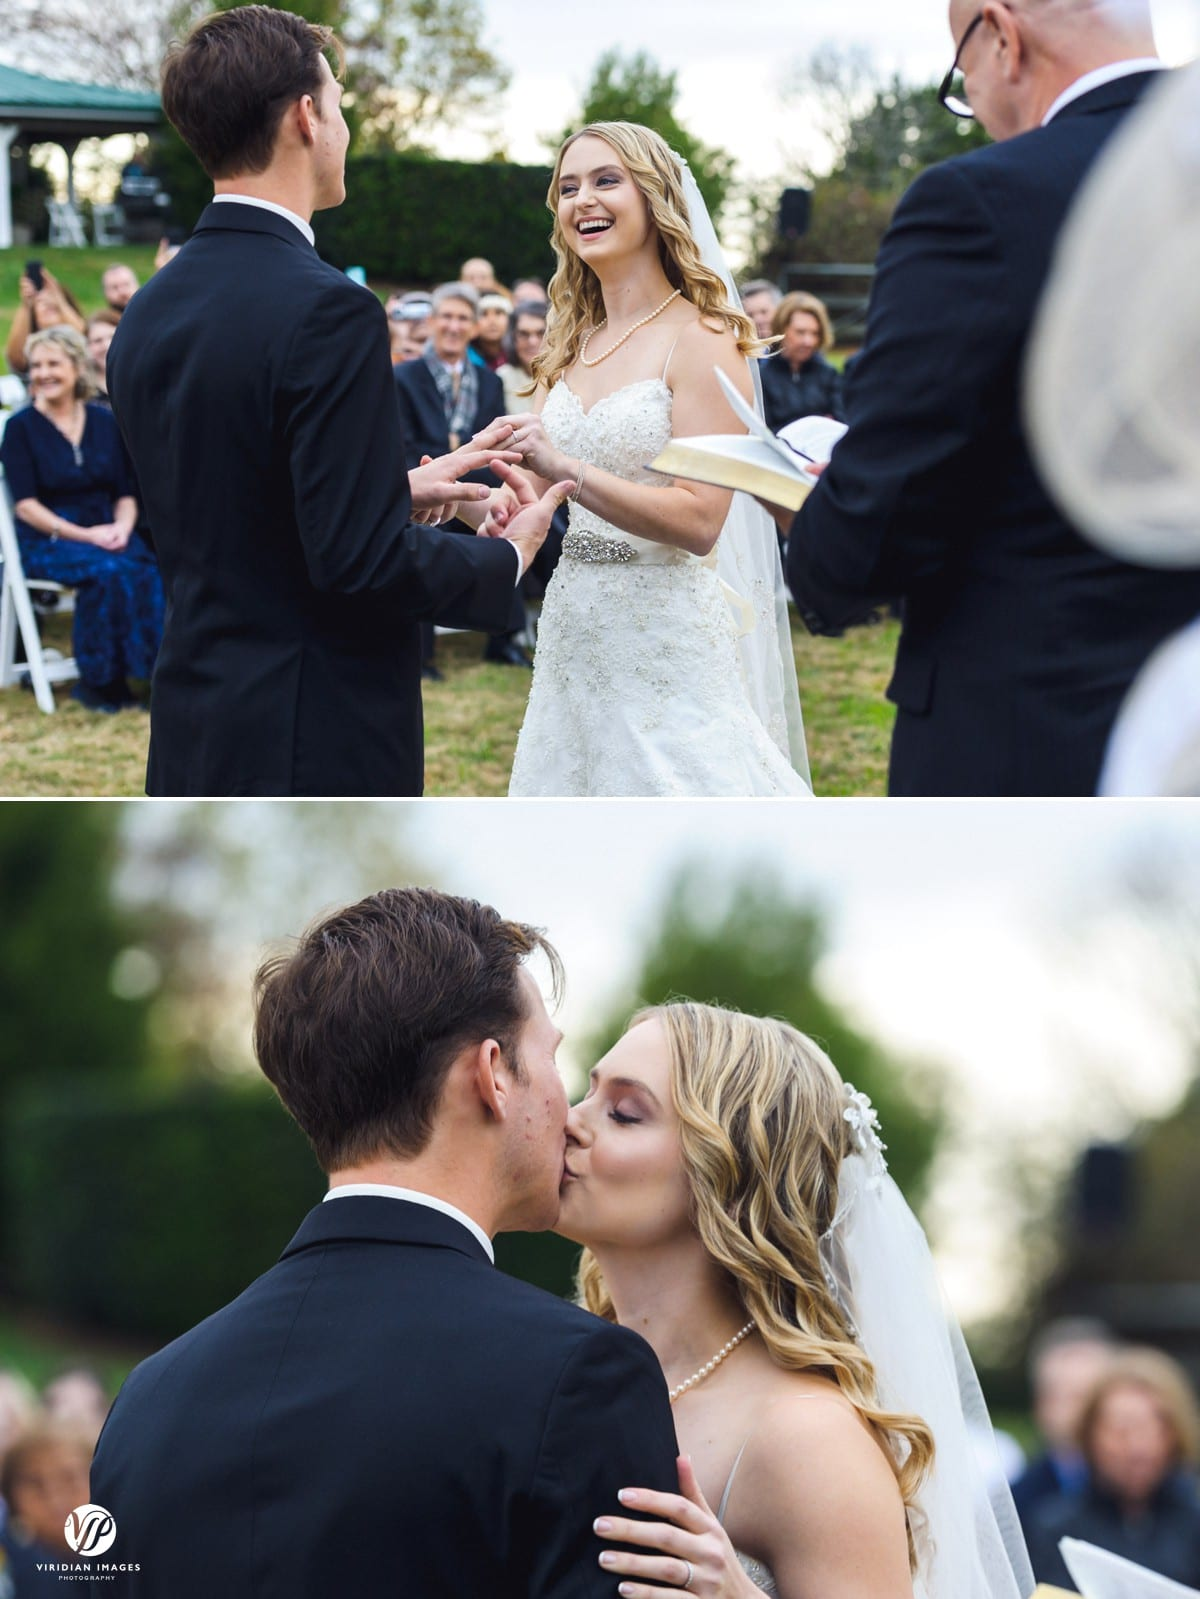 wedding ring and first kiss ceremony Walnut Hill Farm Dalton GA